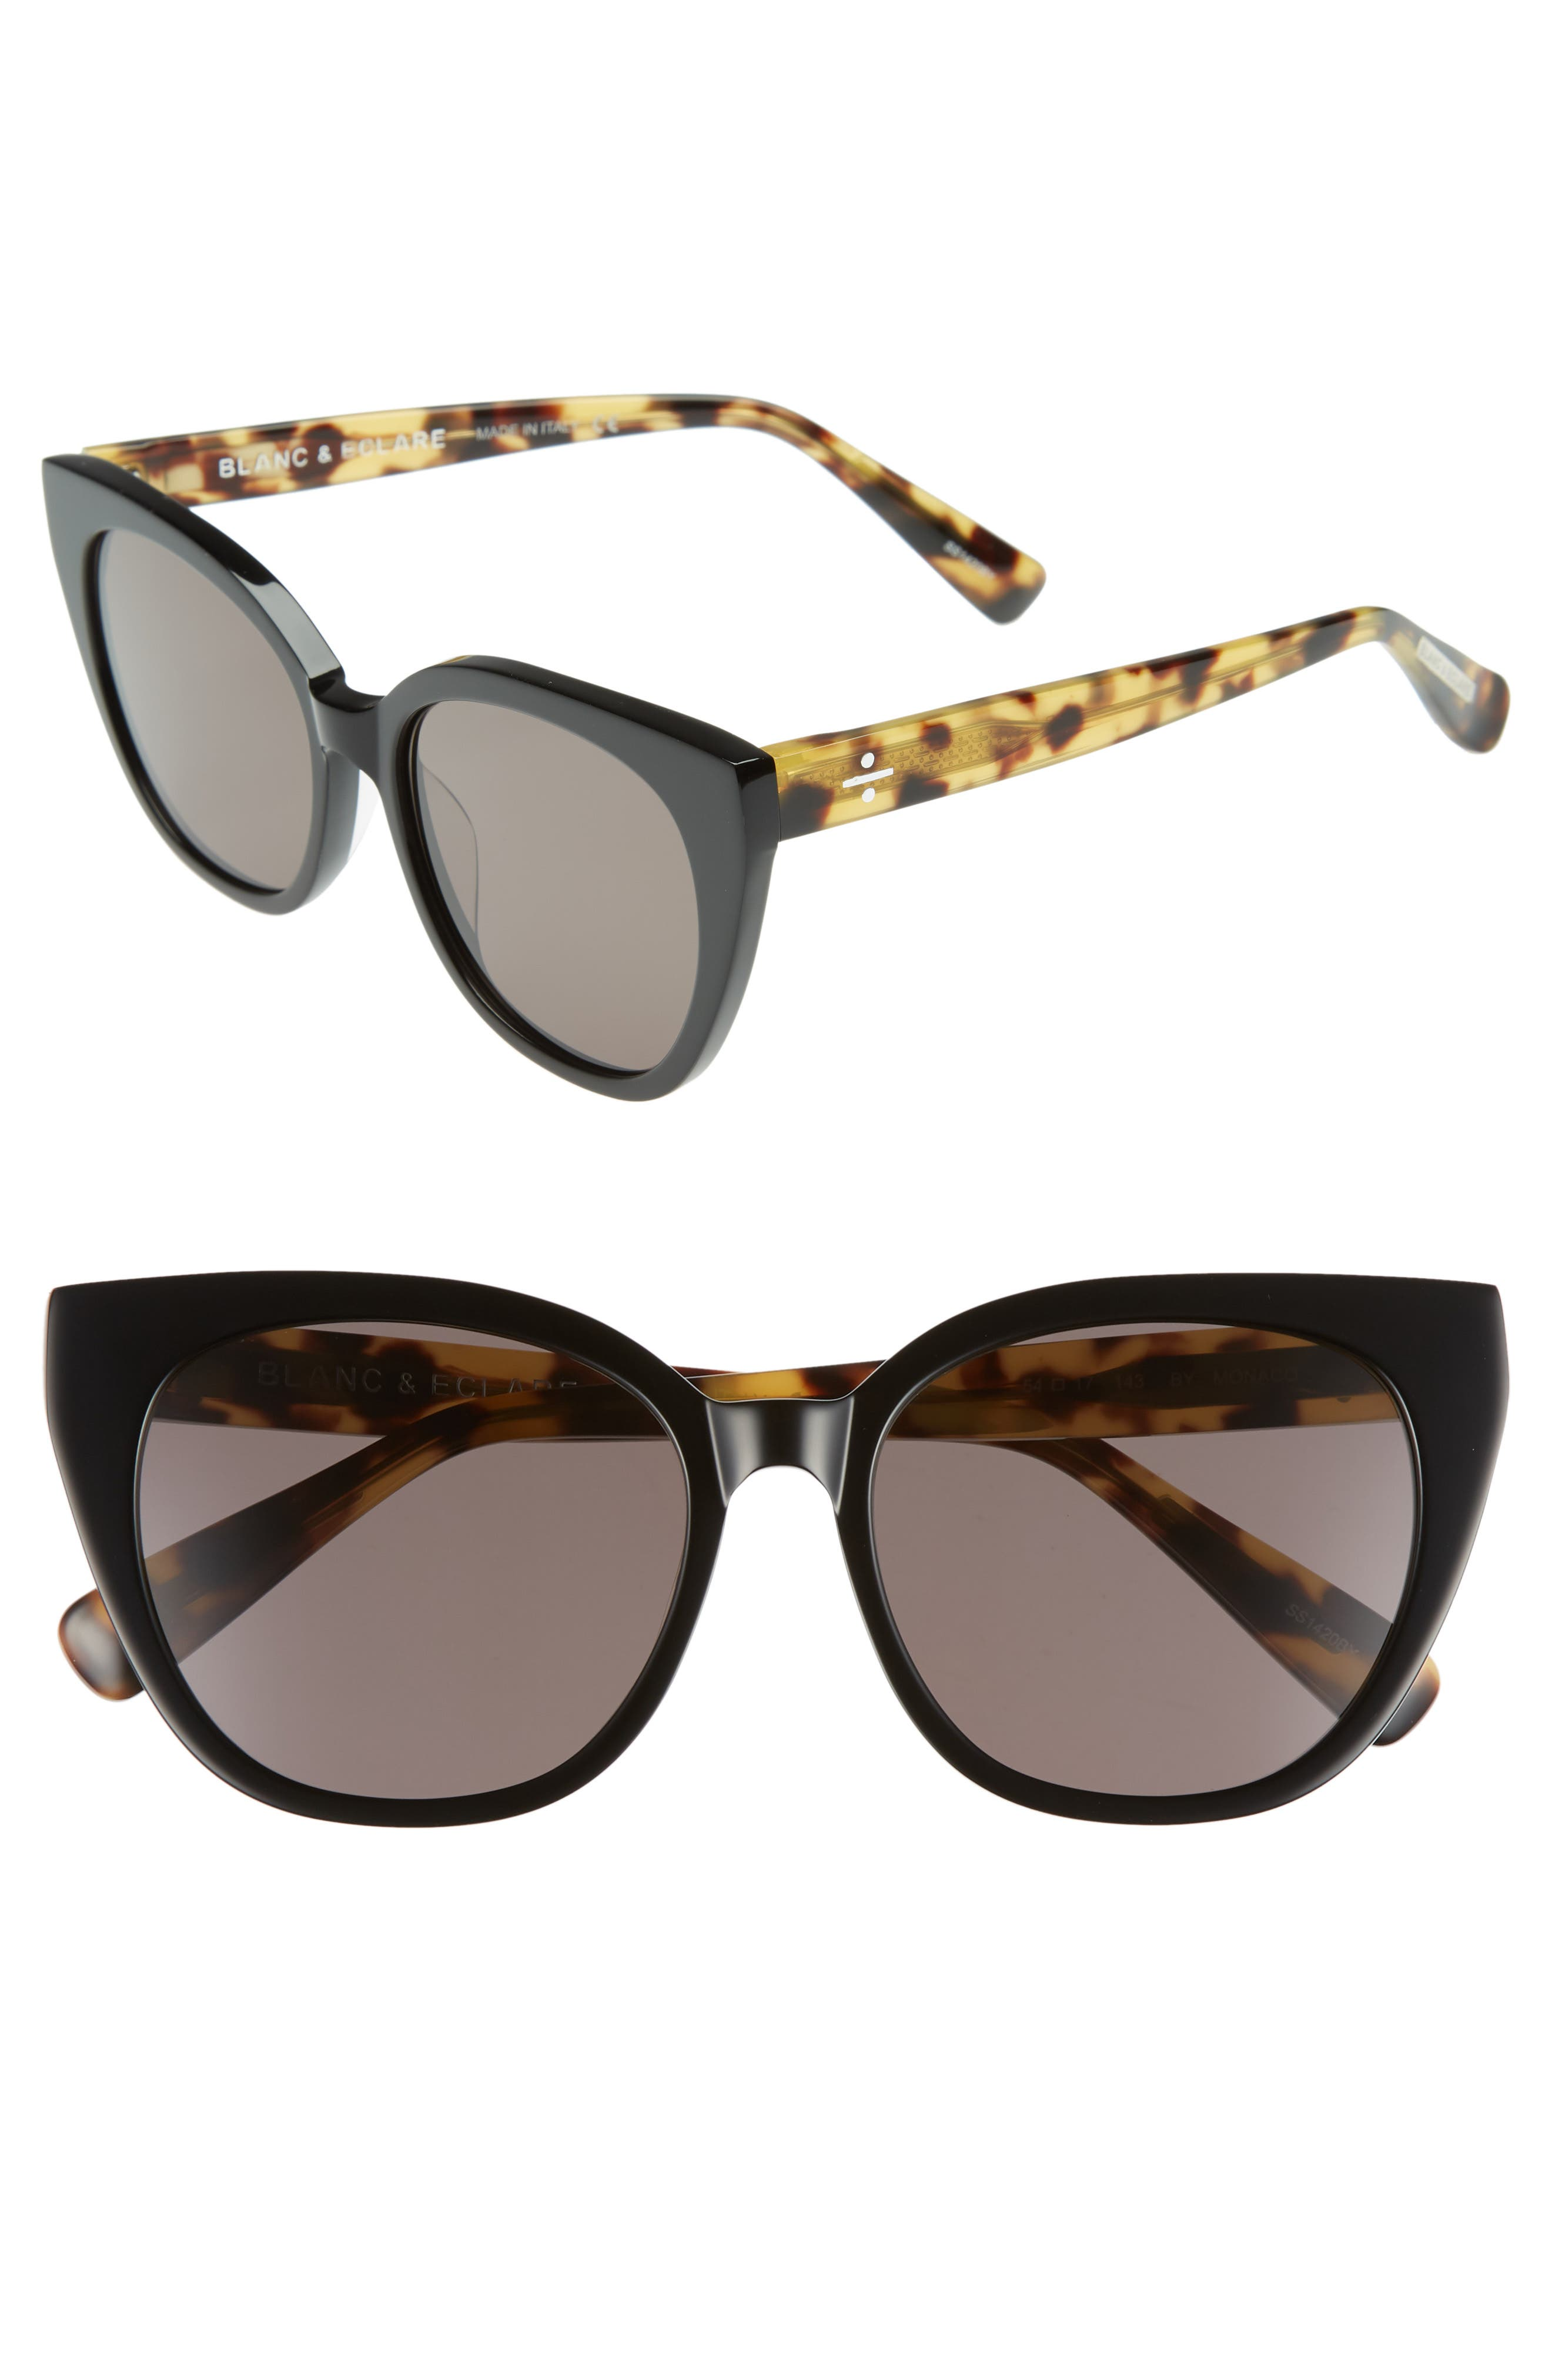 BLANC & ECLARE Monaco 54mm Cat Eye Sunglasses,                             Main thumbnail 1, color,                             Black/ Lemon Tortoise/ Grey